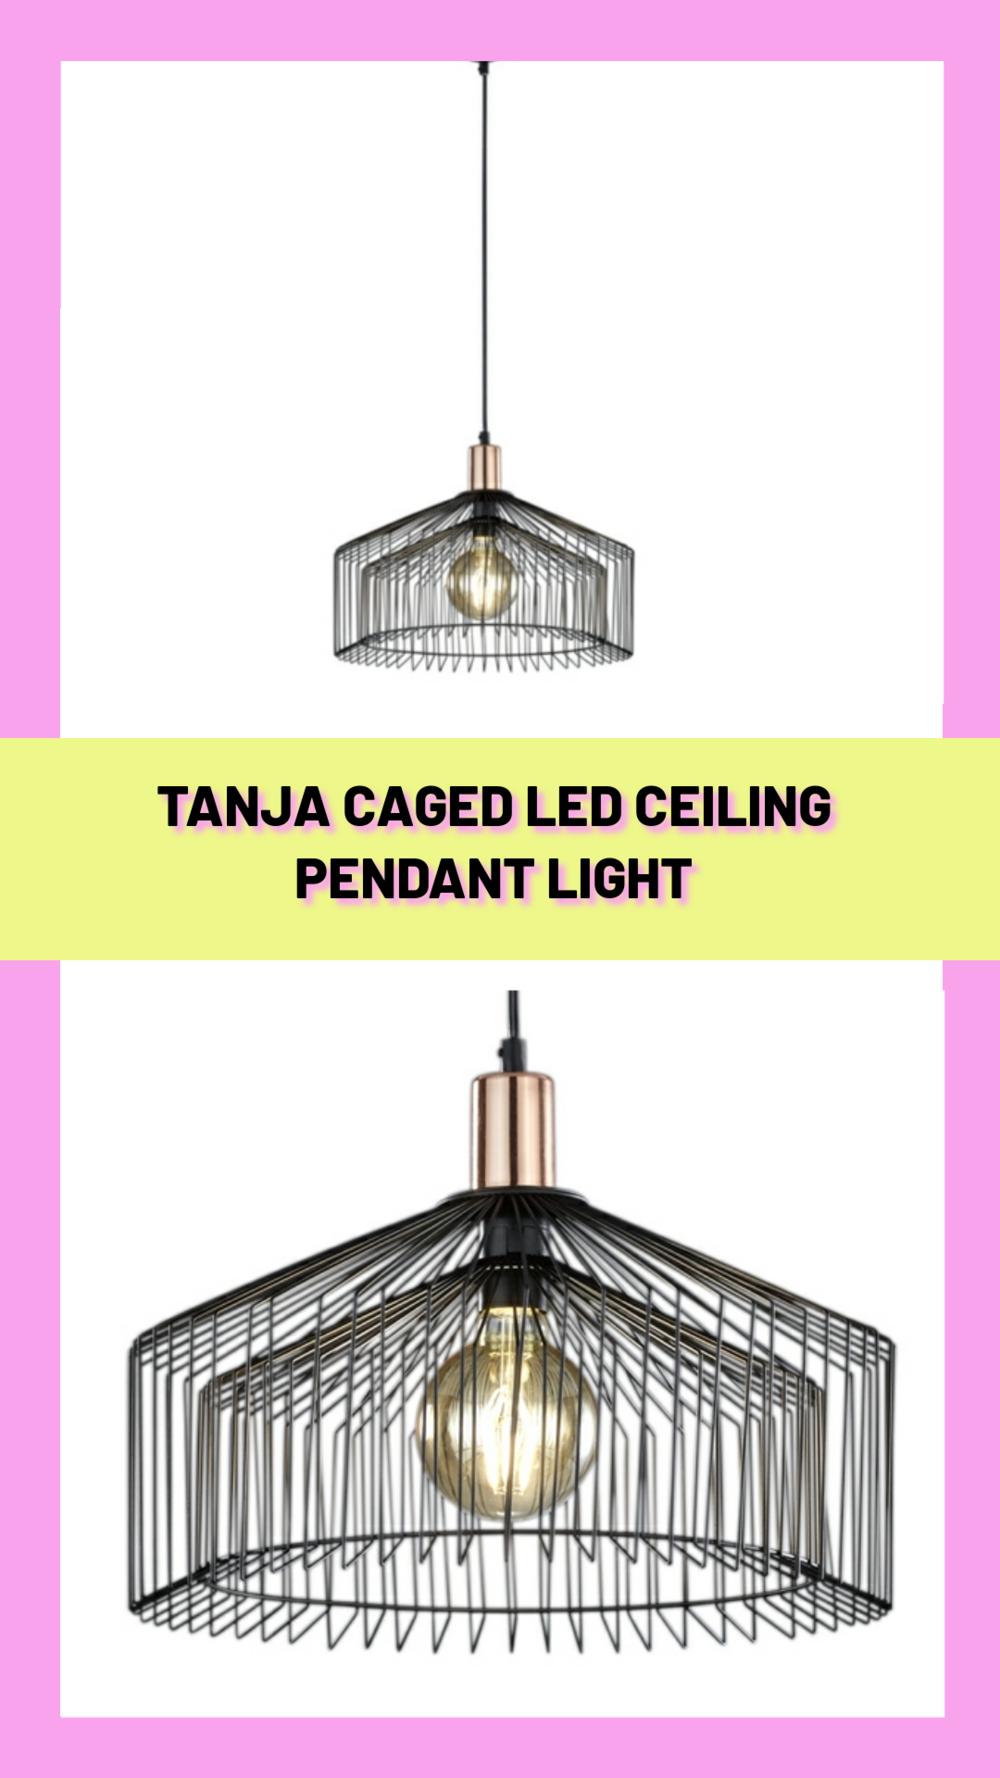 tanja_caged_led_ceiling_pendant_light_instagram_stories.png